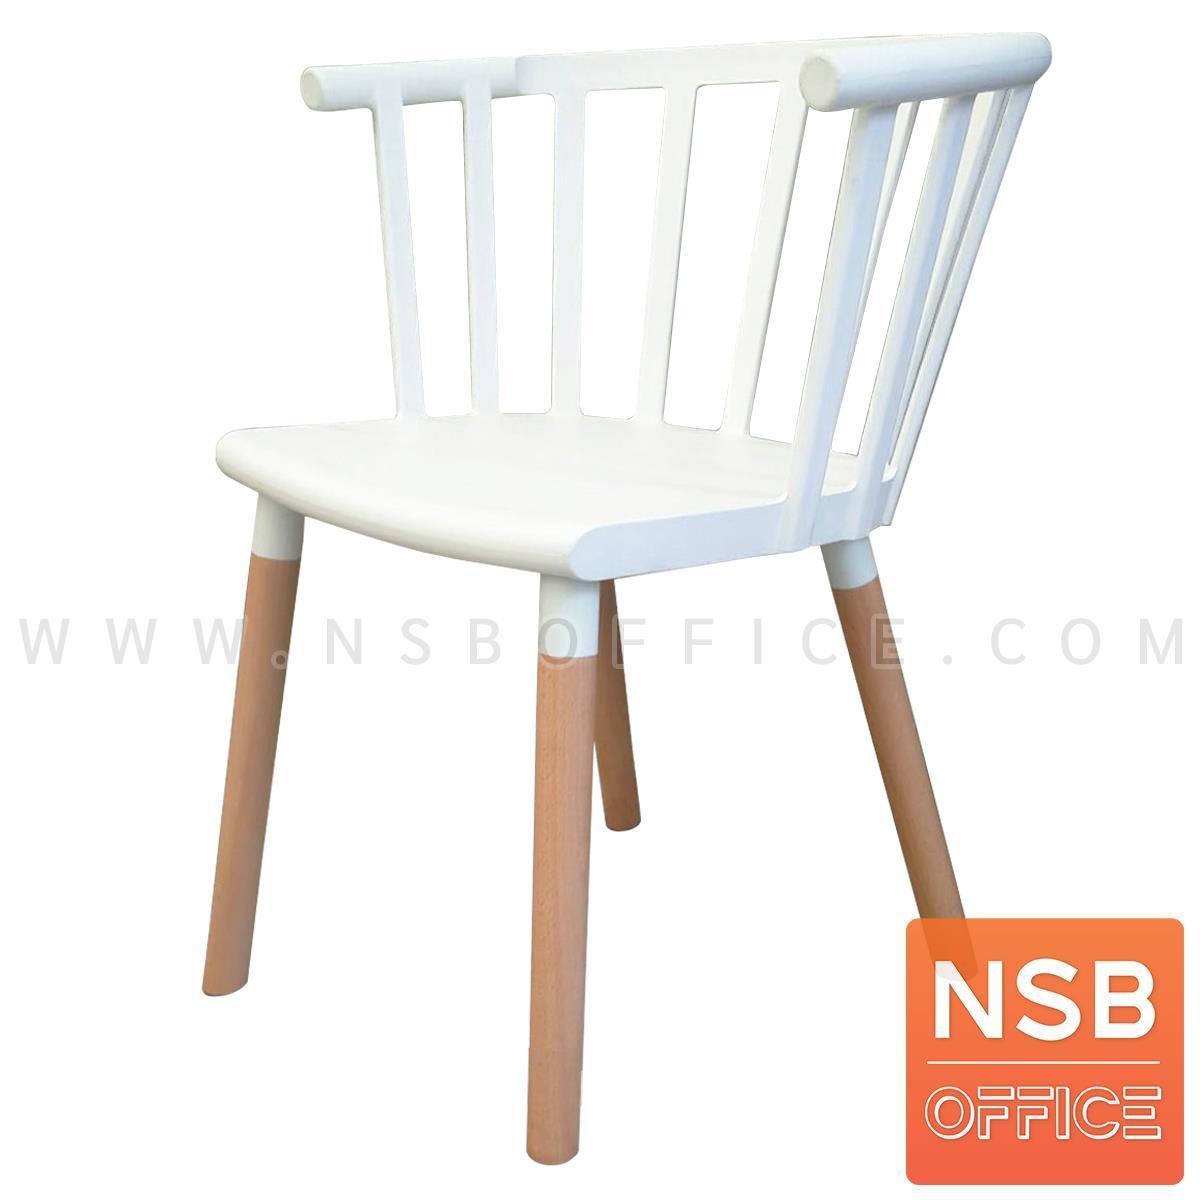 B29A377:เก้าอี้โมเดิร์น รุ่น Olympian ขนาด 56.5W cm. ขาไม้